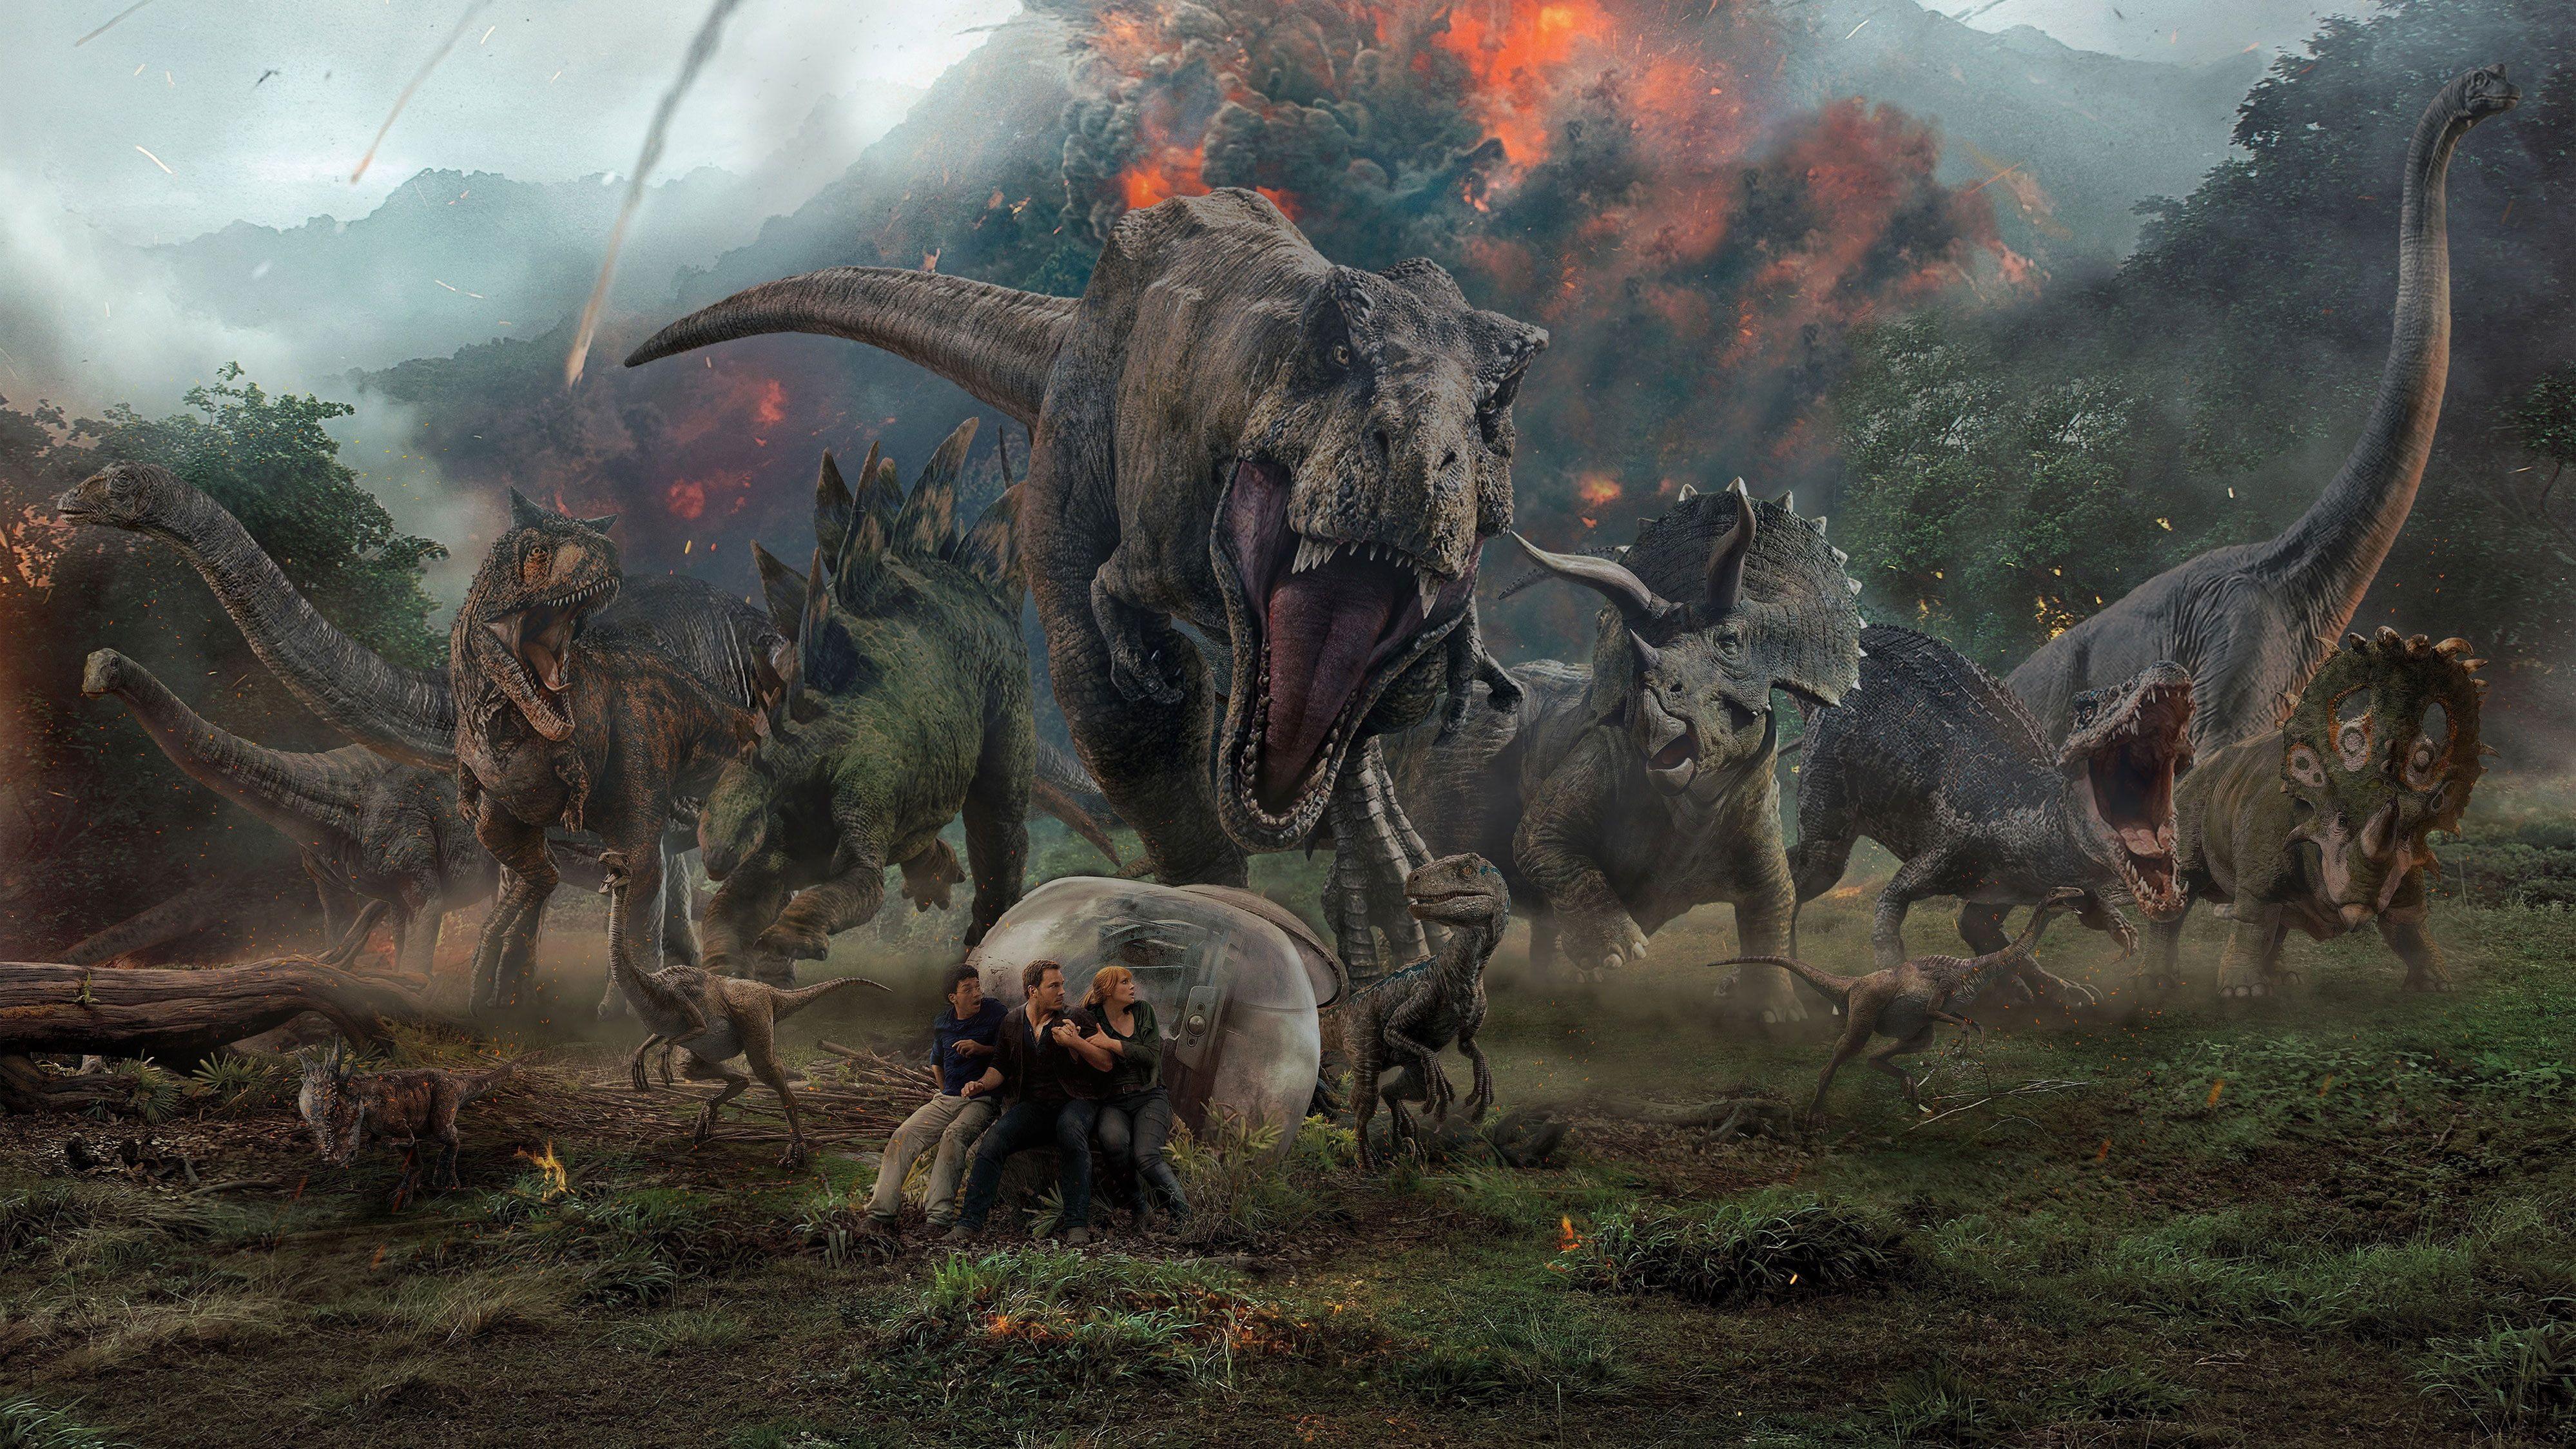 Jurassic World Fallen Kingdom Jurassic World 2018 Movies Movies 4k Hd 4k Wallpa In 2020 Jurassic World Wallpaper Jurassic World Fallen Kingdom Jurassic Park World